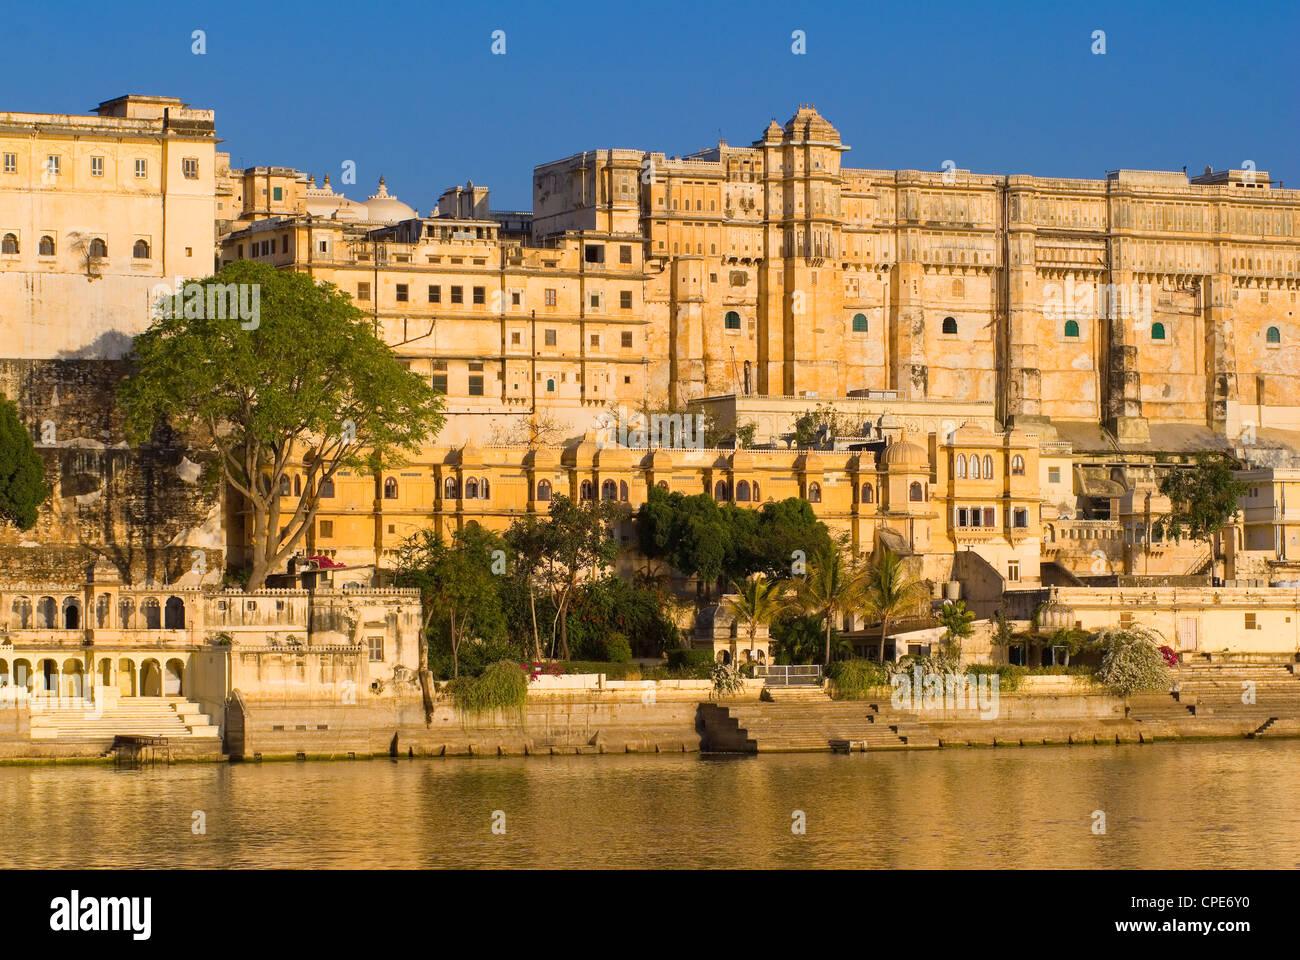 Udaipur, Rajasthan, India, Asia - Stock Image